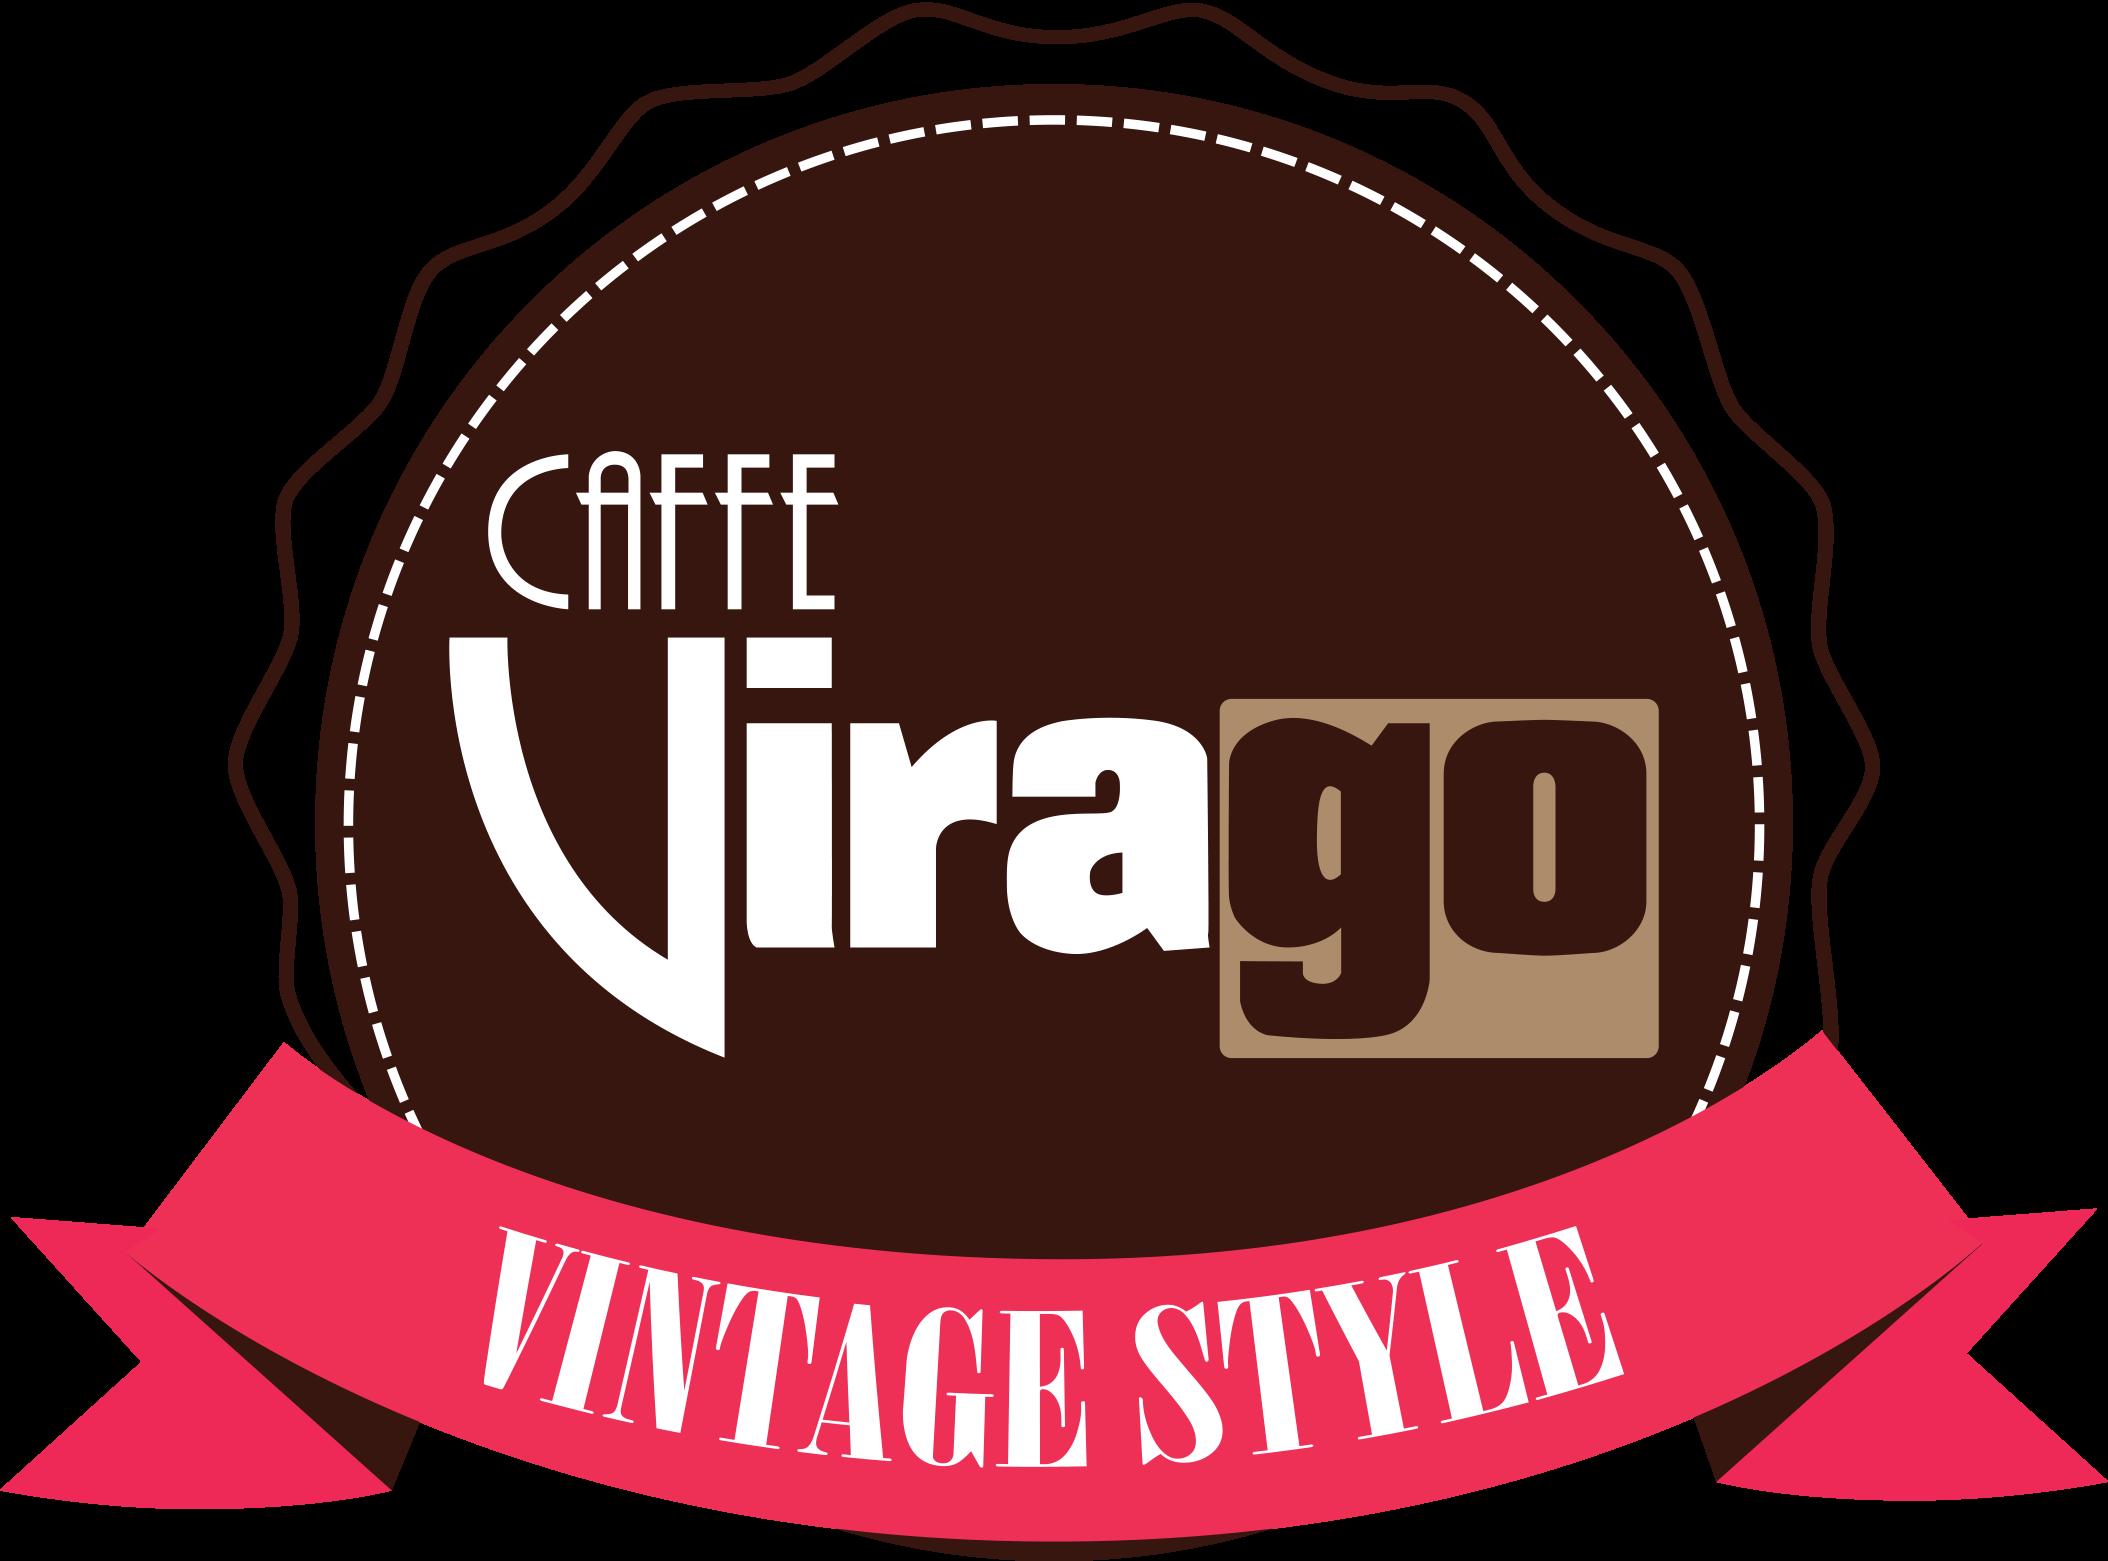 Caffè Virago e Smedile Fc Napoli : La partnership inizia!